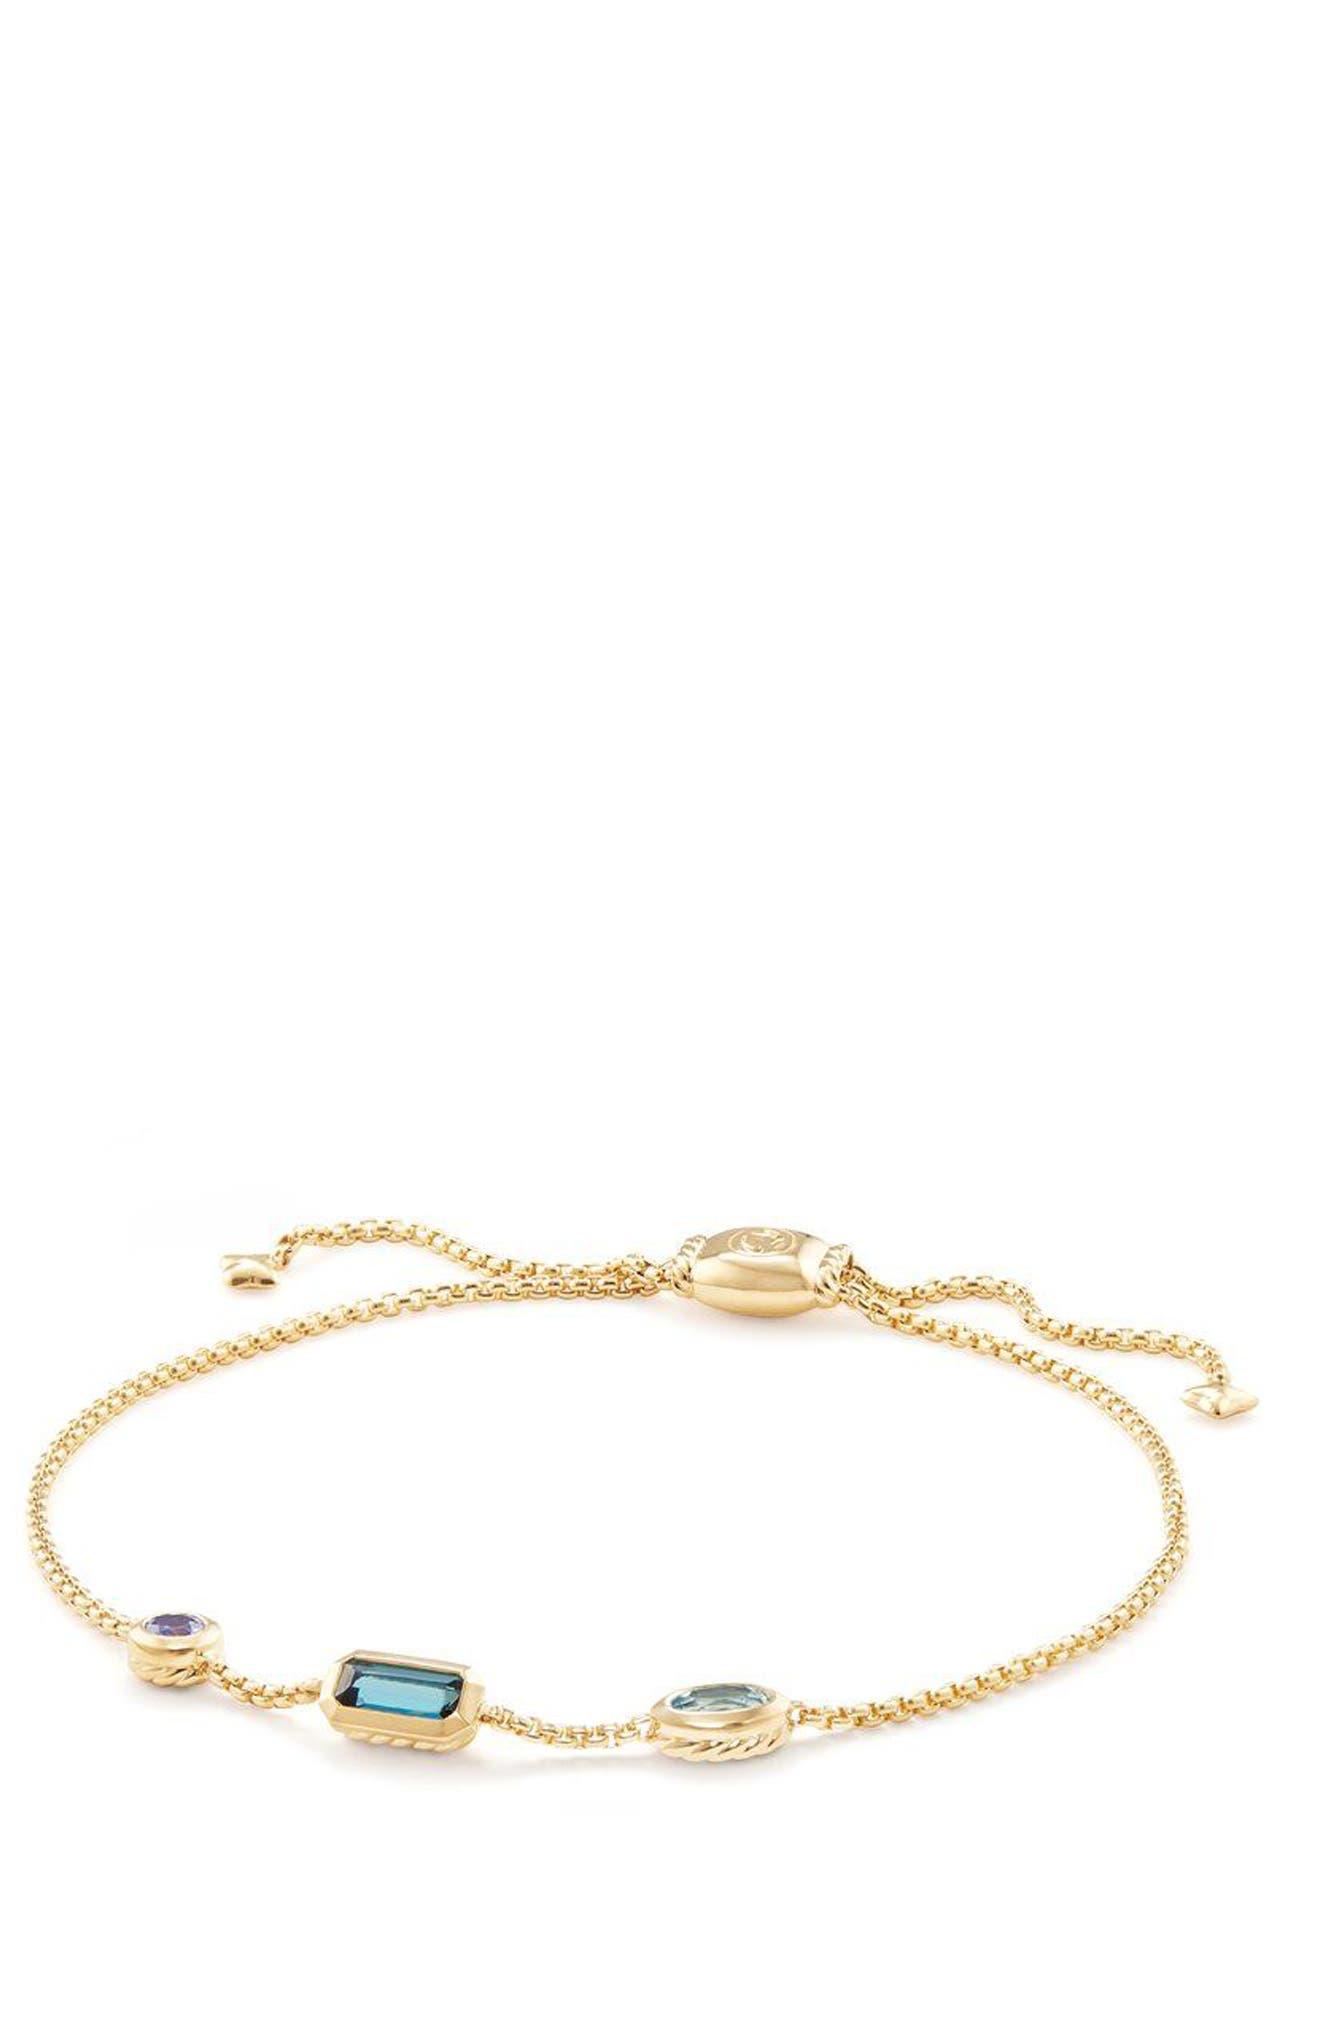 Novella Chain Bracelet in 18K Gold,                             Main thumbnail 1, color,                             GOLD/ HAMPTON BLUE TOPAZ